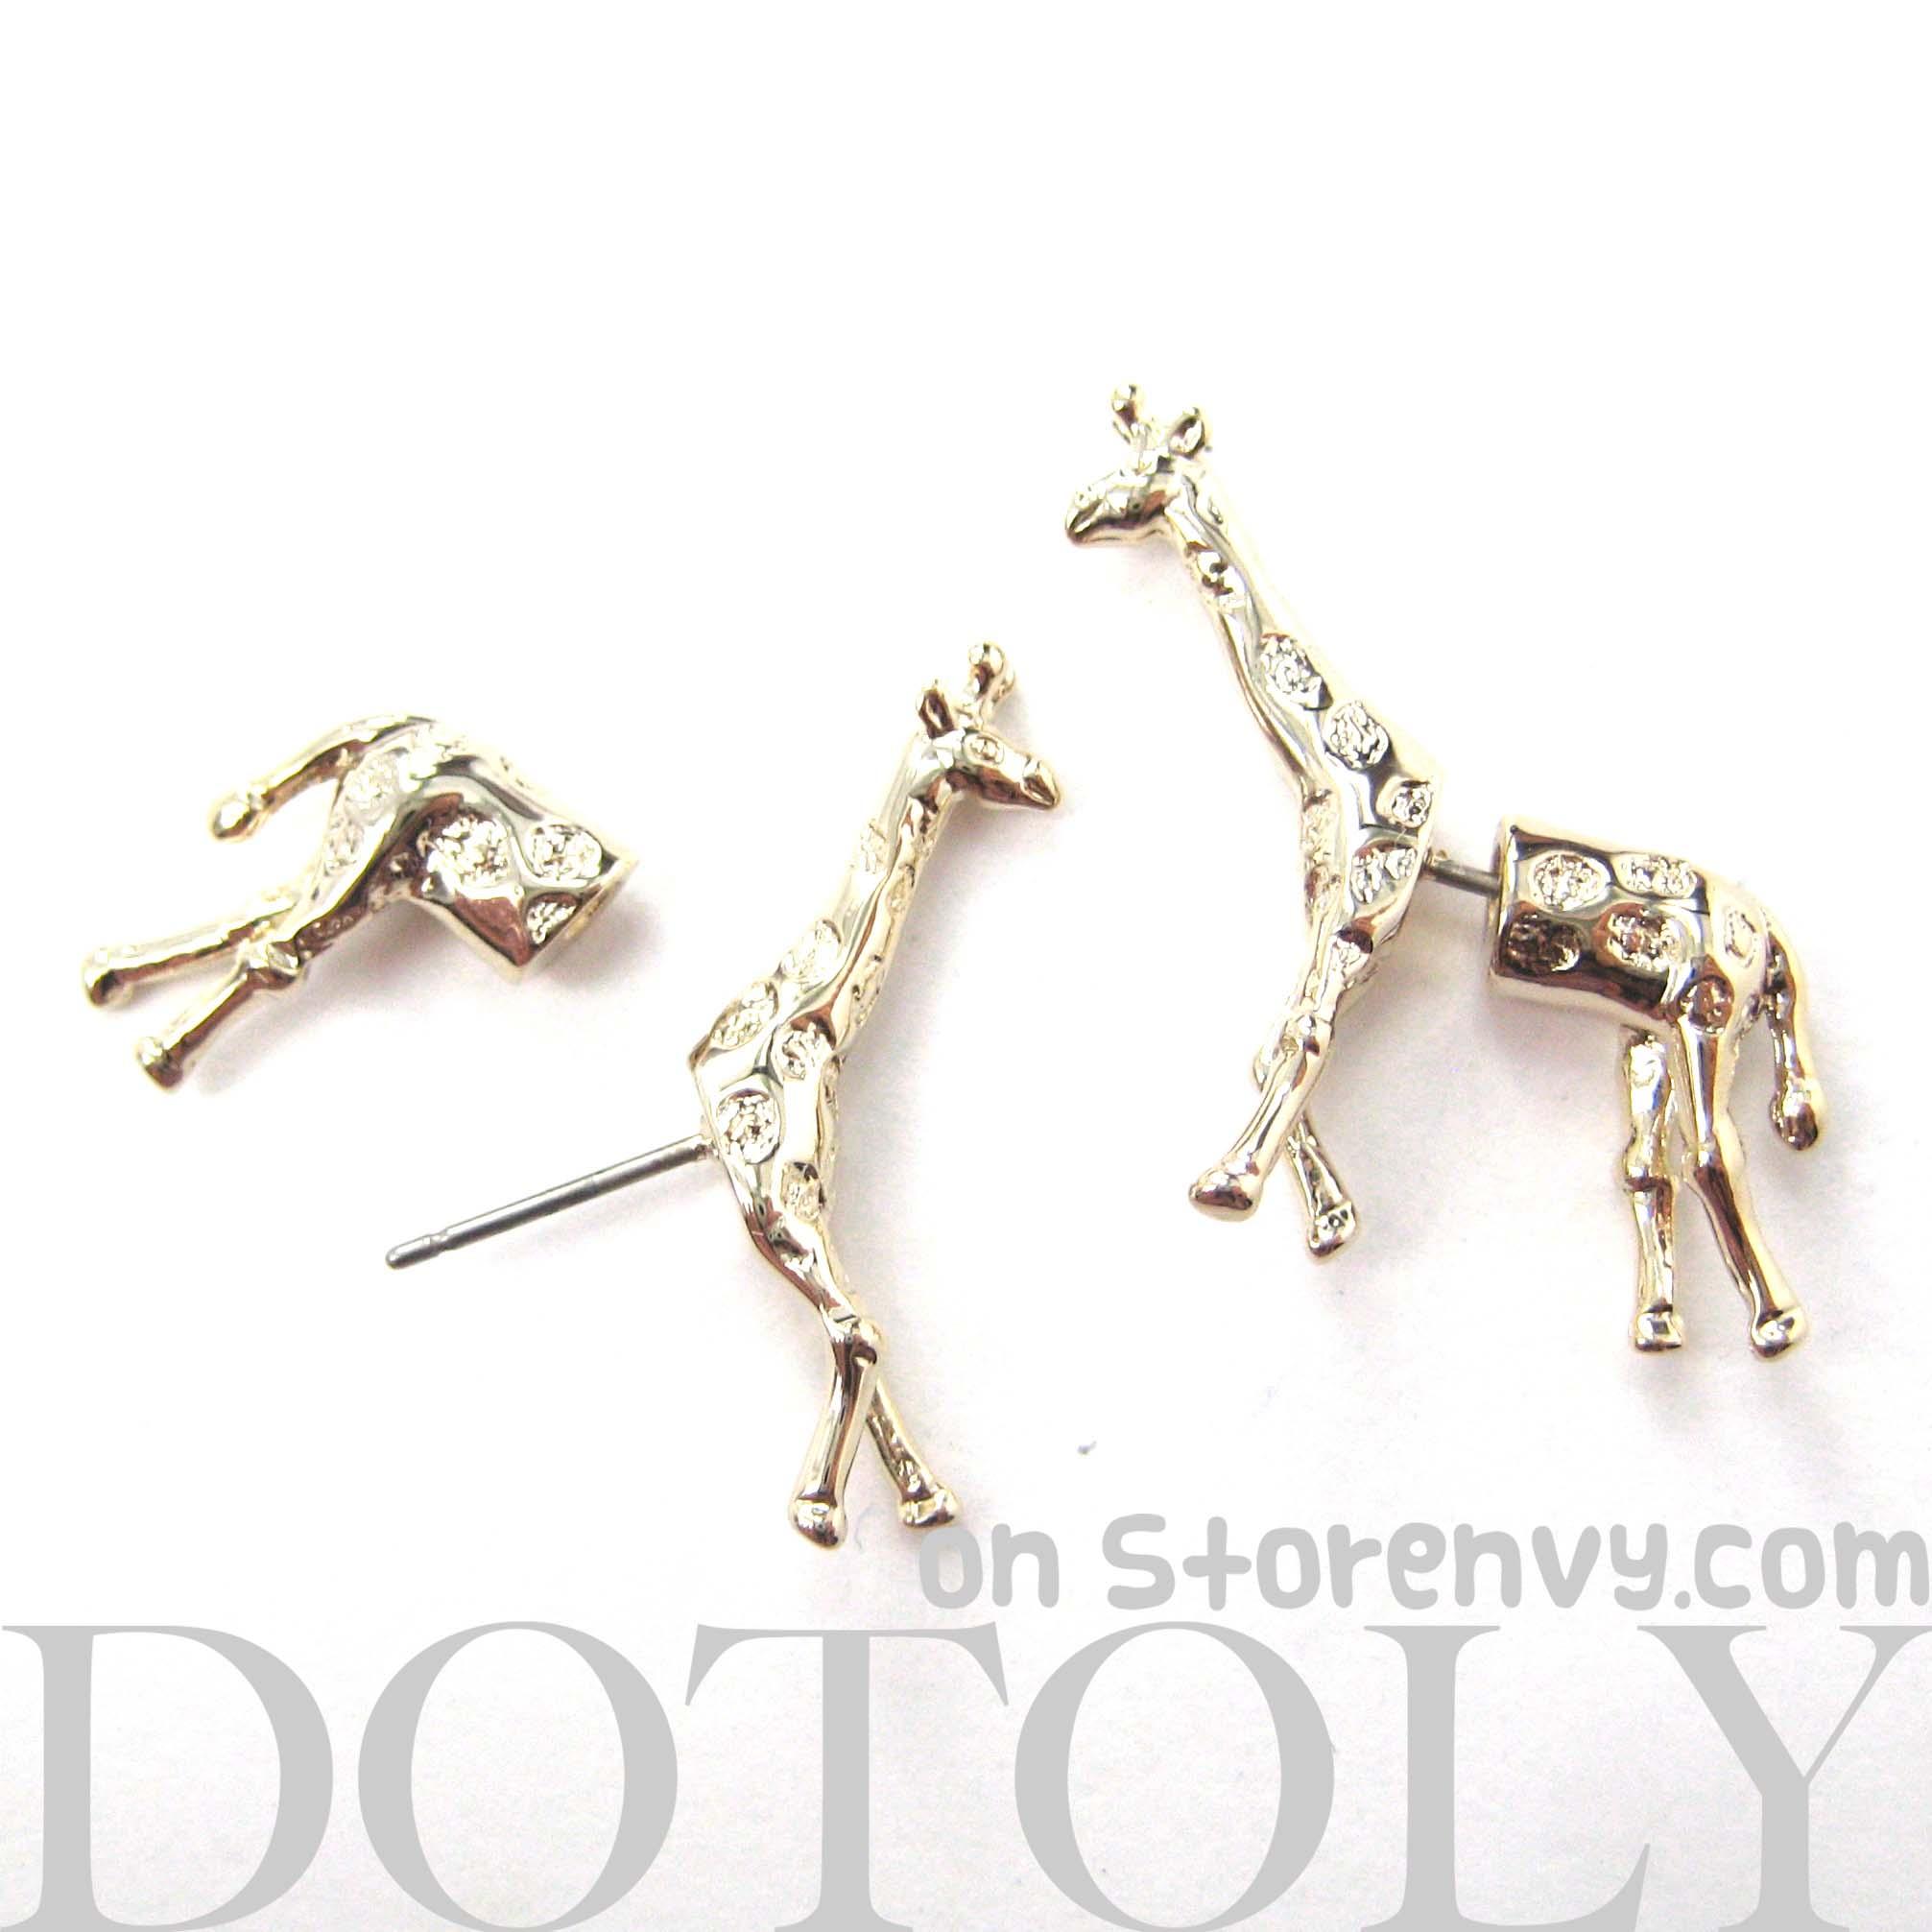 Fake Gauge Realistic Giraffe Animal Stud Earrings In Shiny Gold